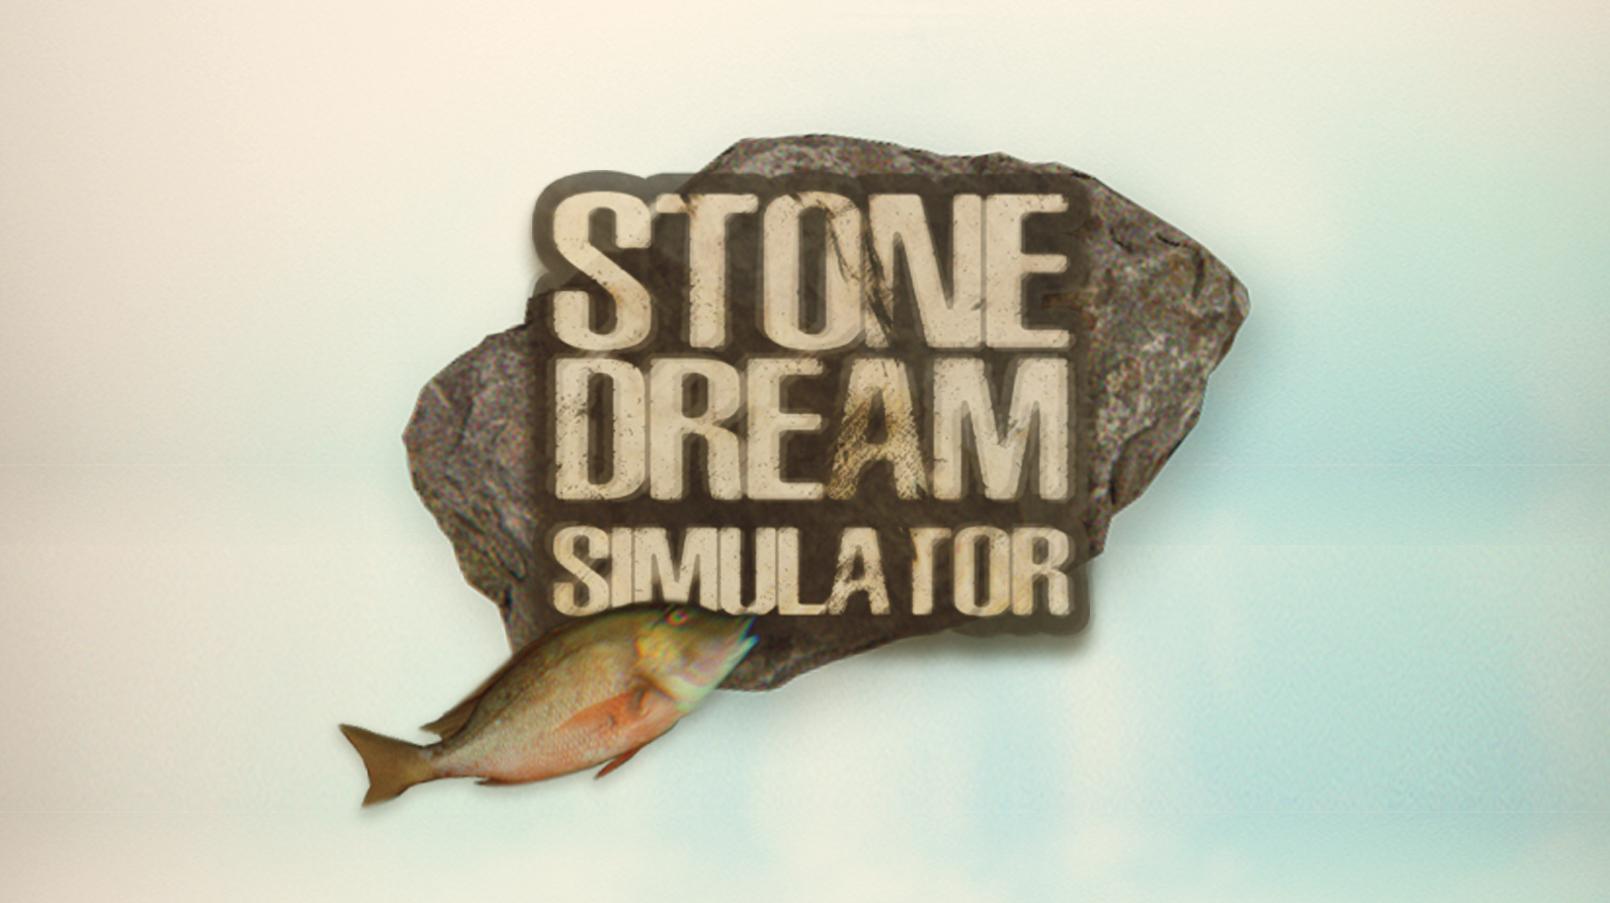 Stone Dream Simulator